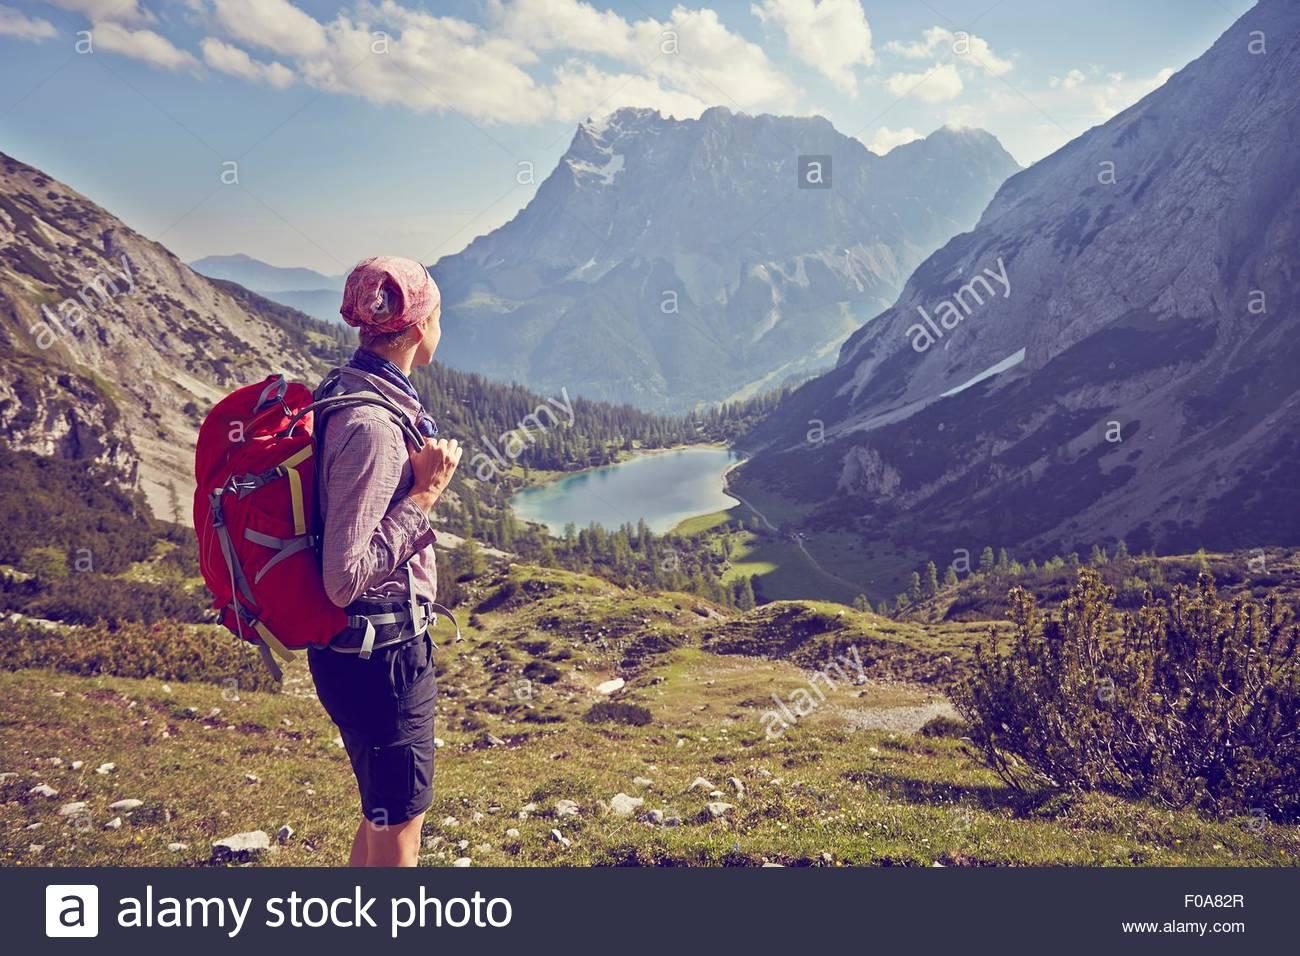 Mujer madura, senderismo montaña abajo, mirando a ver, Ehrwald, Tirol, Austria Imagen De Stock